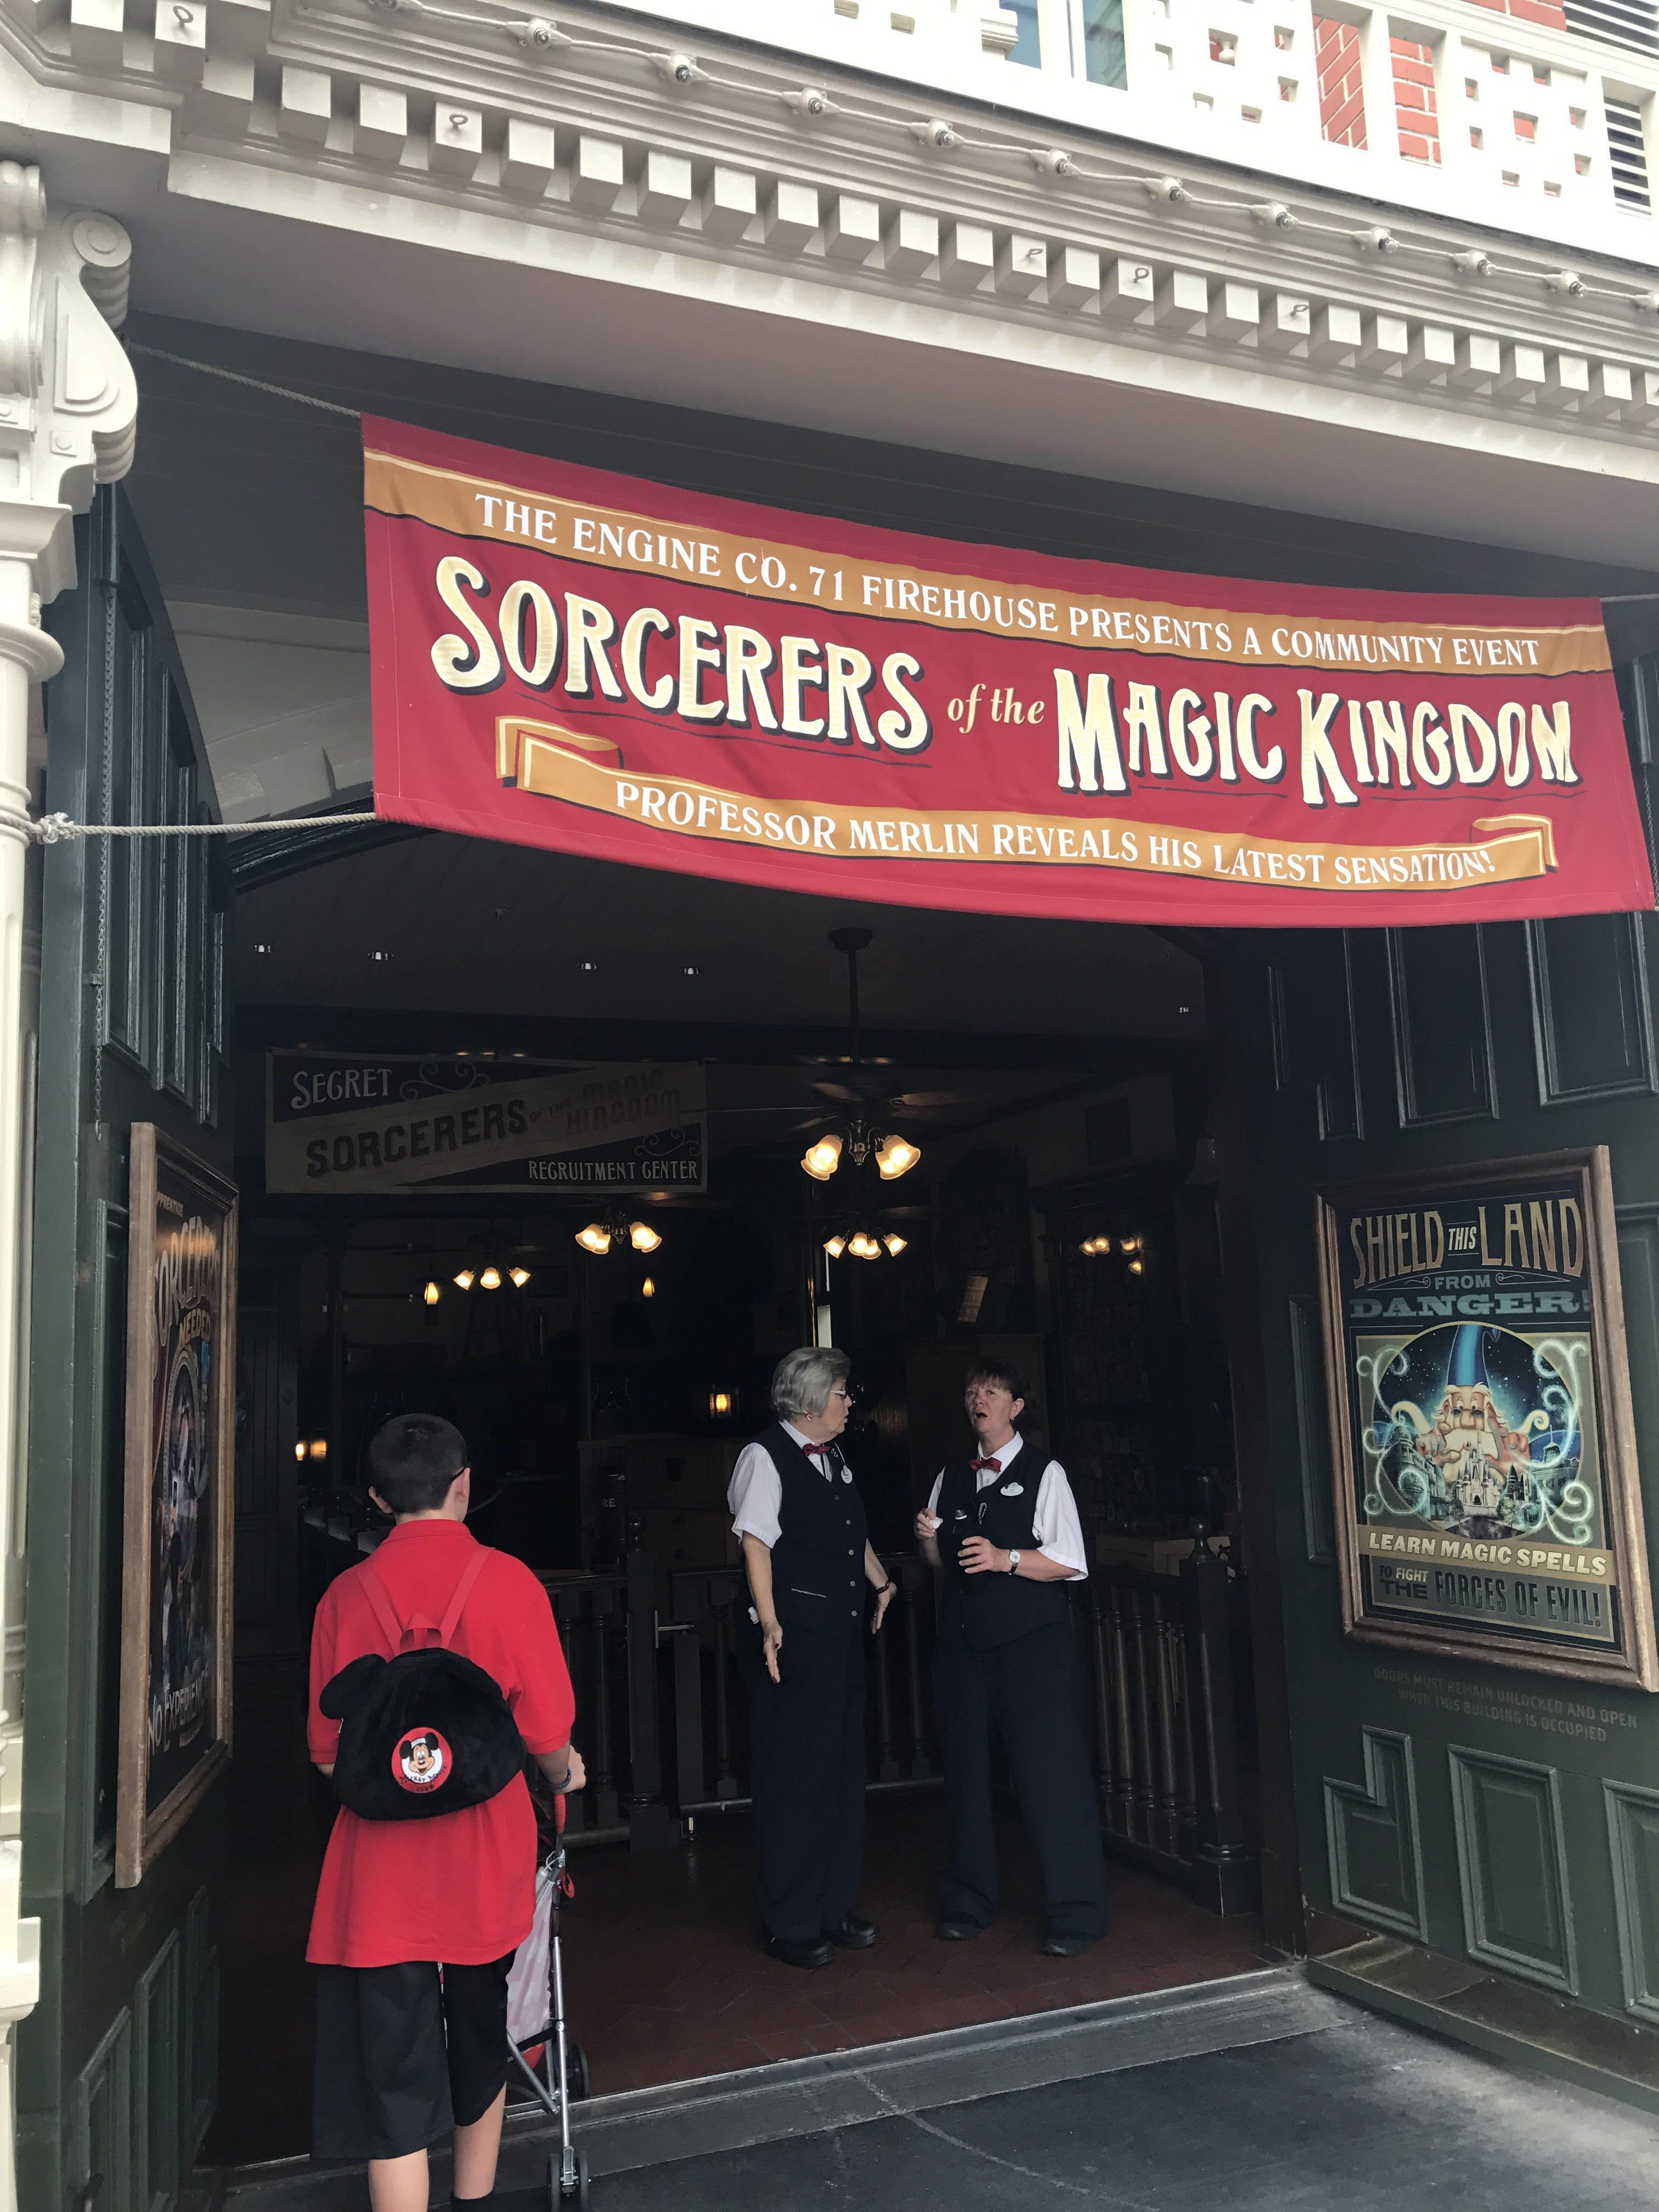 Firehouse at Disney's Magic Kingdom